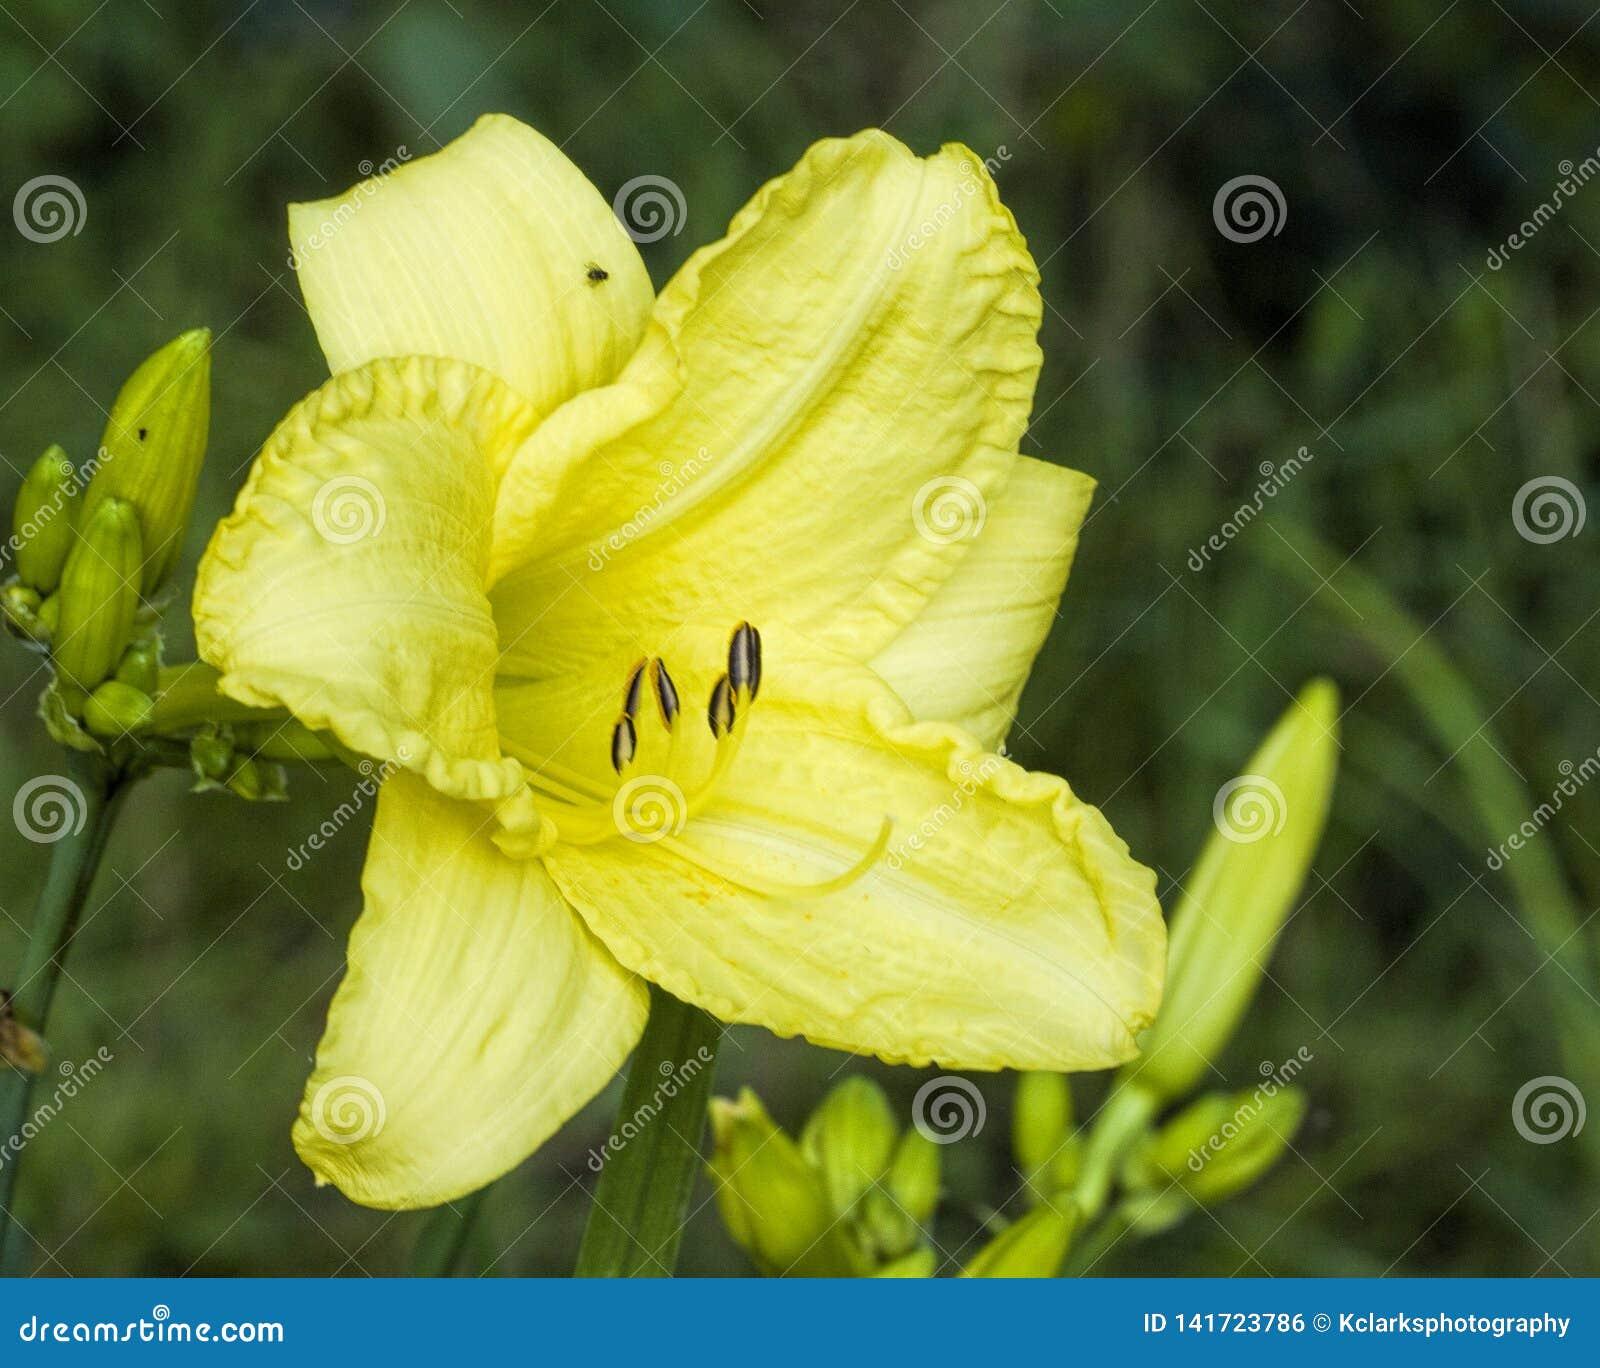 Daylily amarillo limón - Hemerocallis